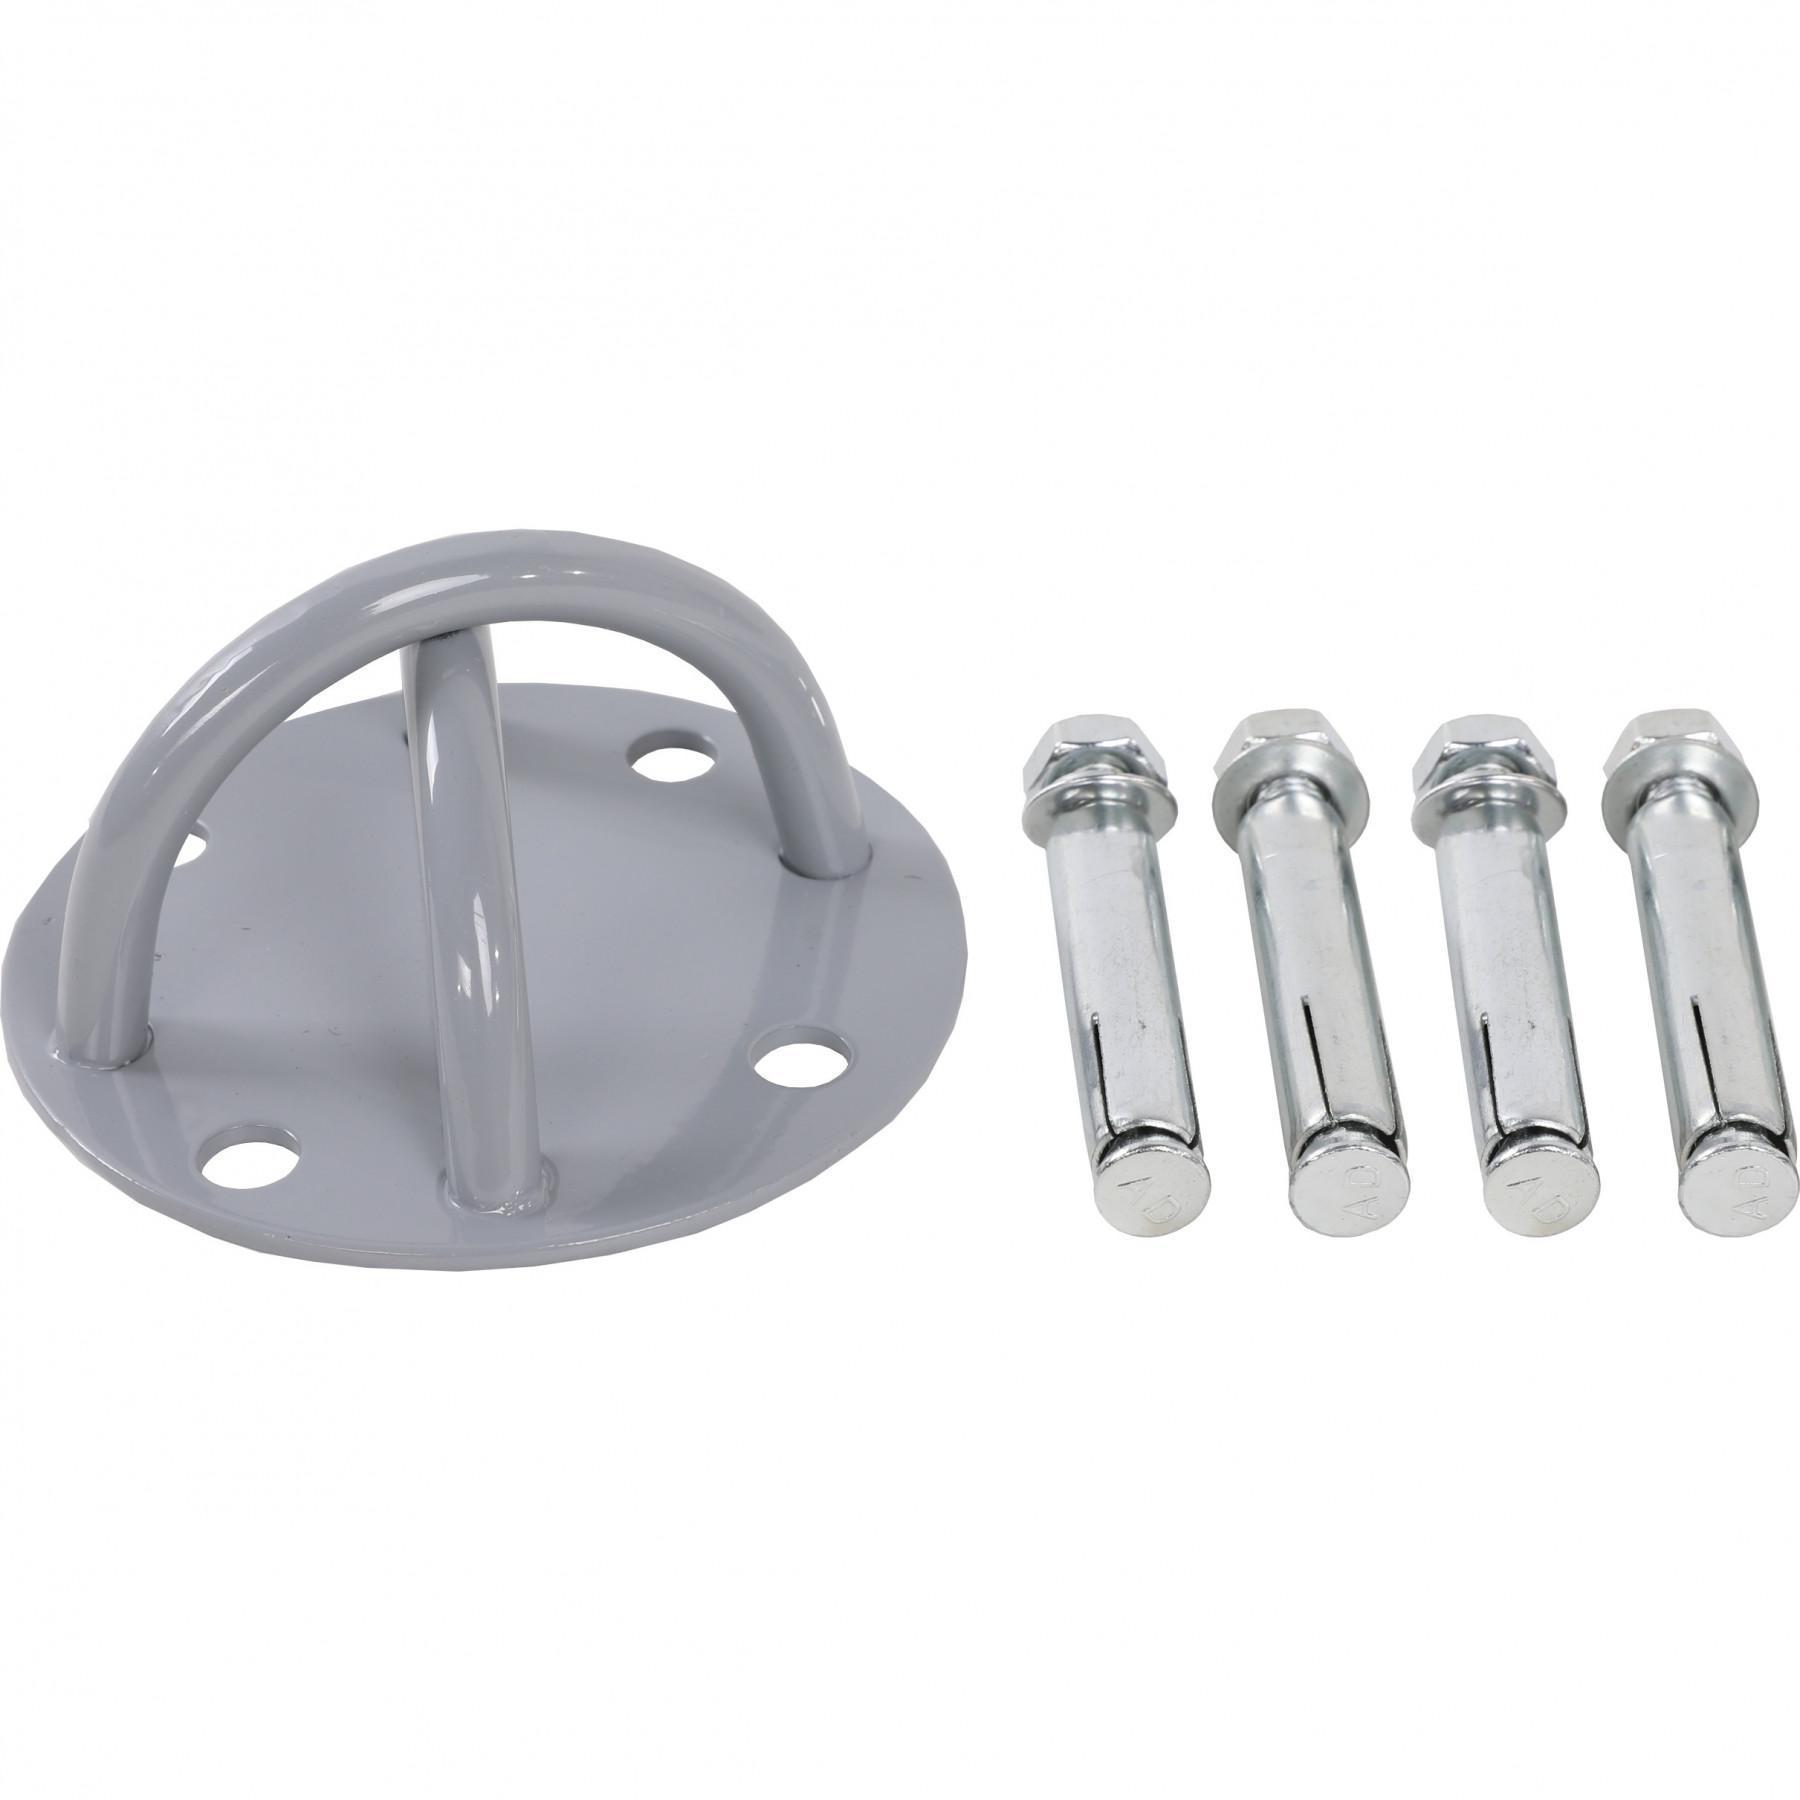 Hook for suspension strap trainer Sporti France